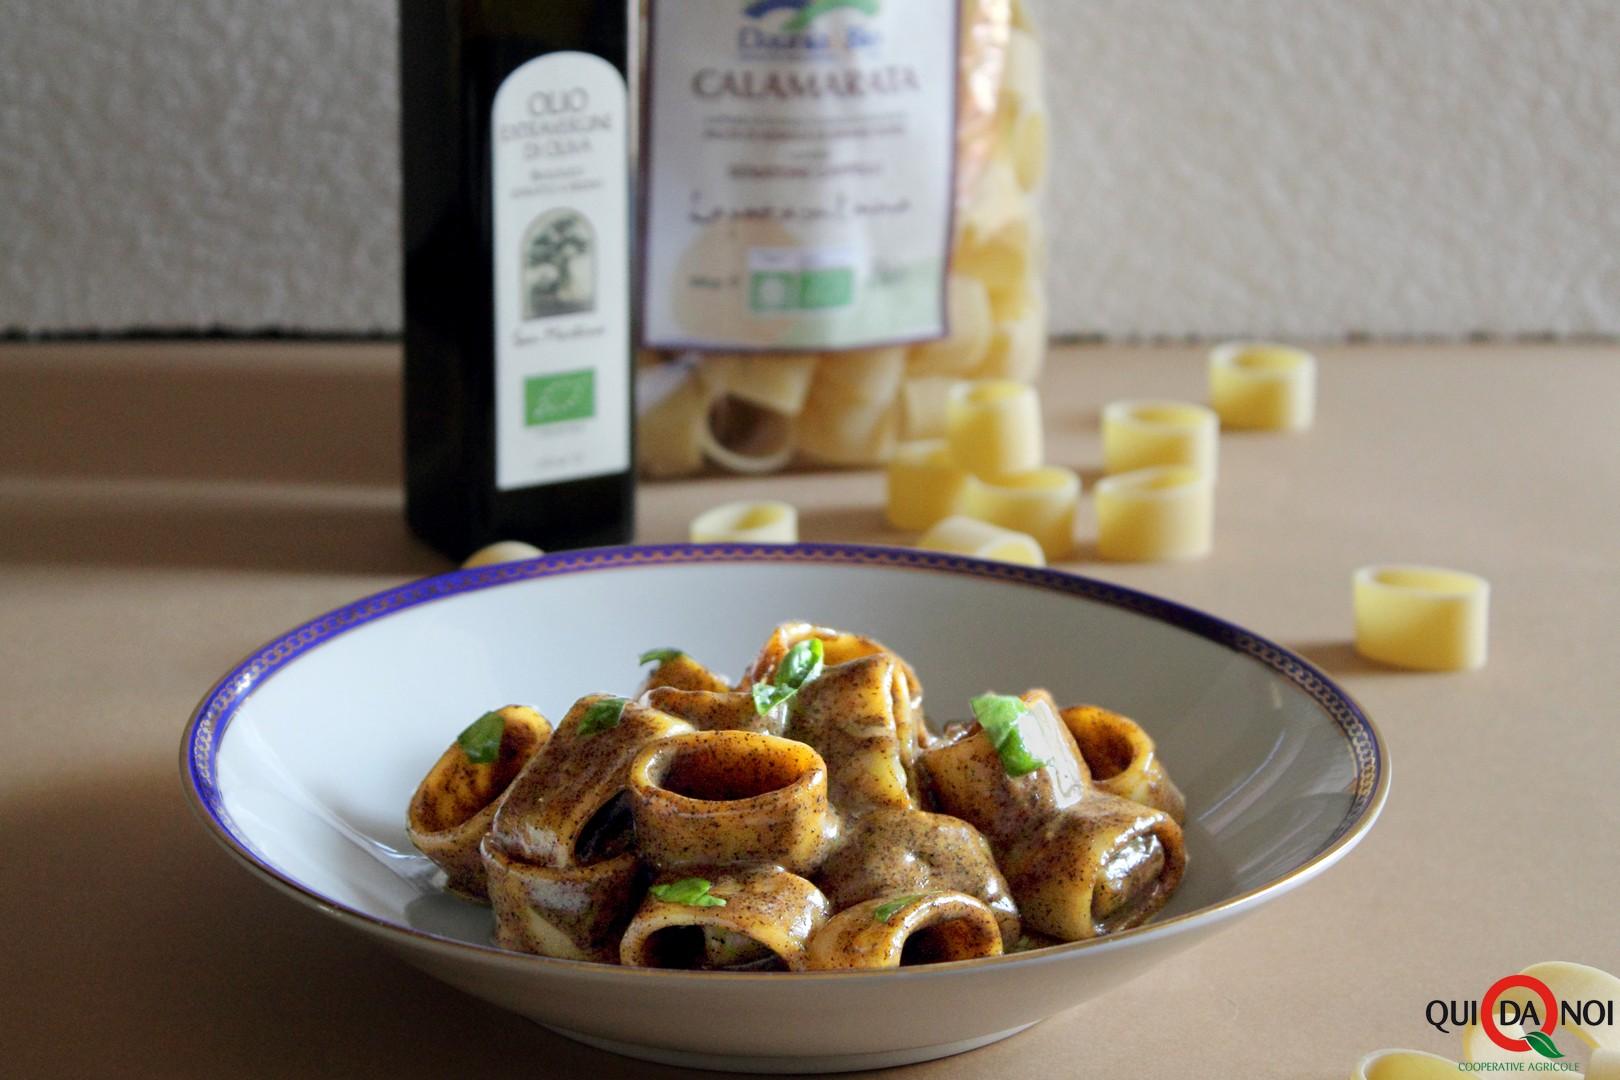 Calamarata-Zabaione-Parmigiano-Reggiano-Caffe'_IMG1_Uberti